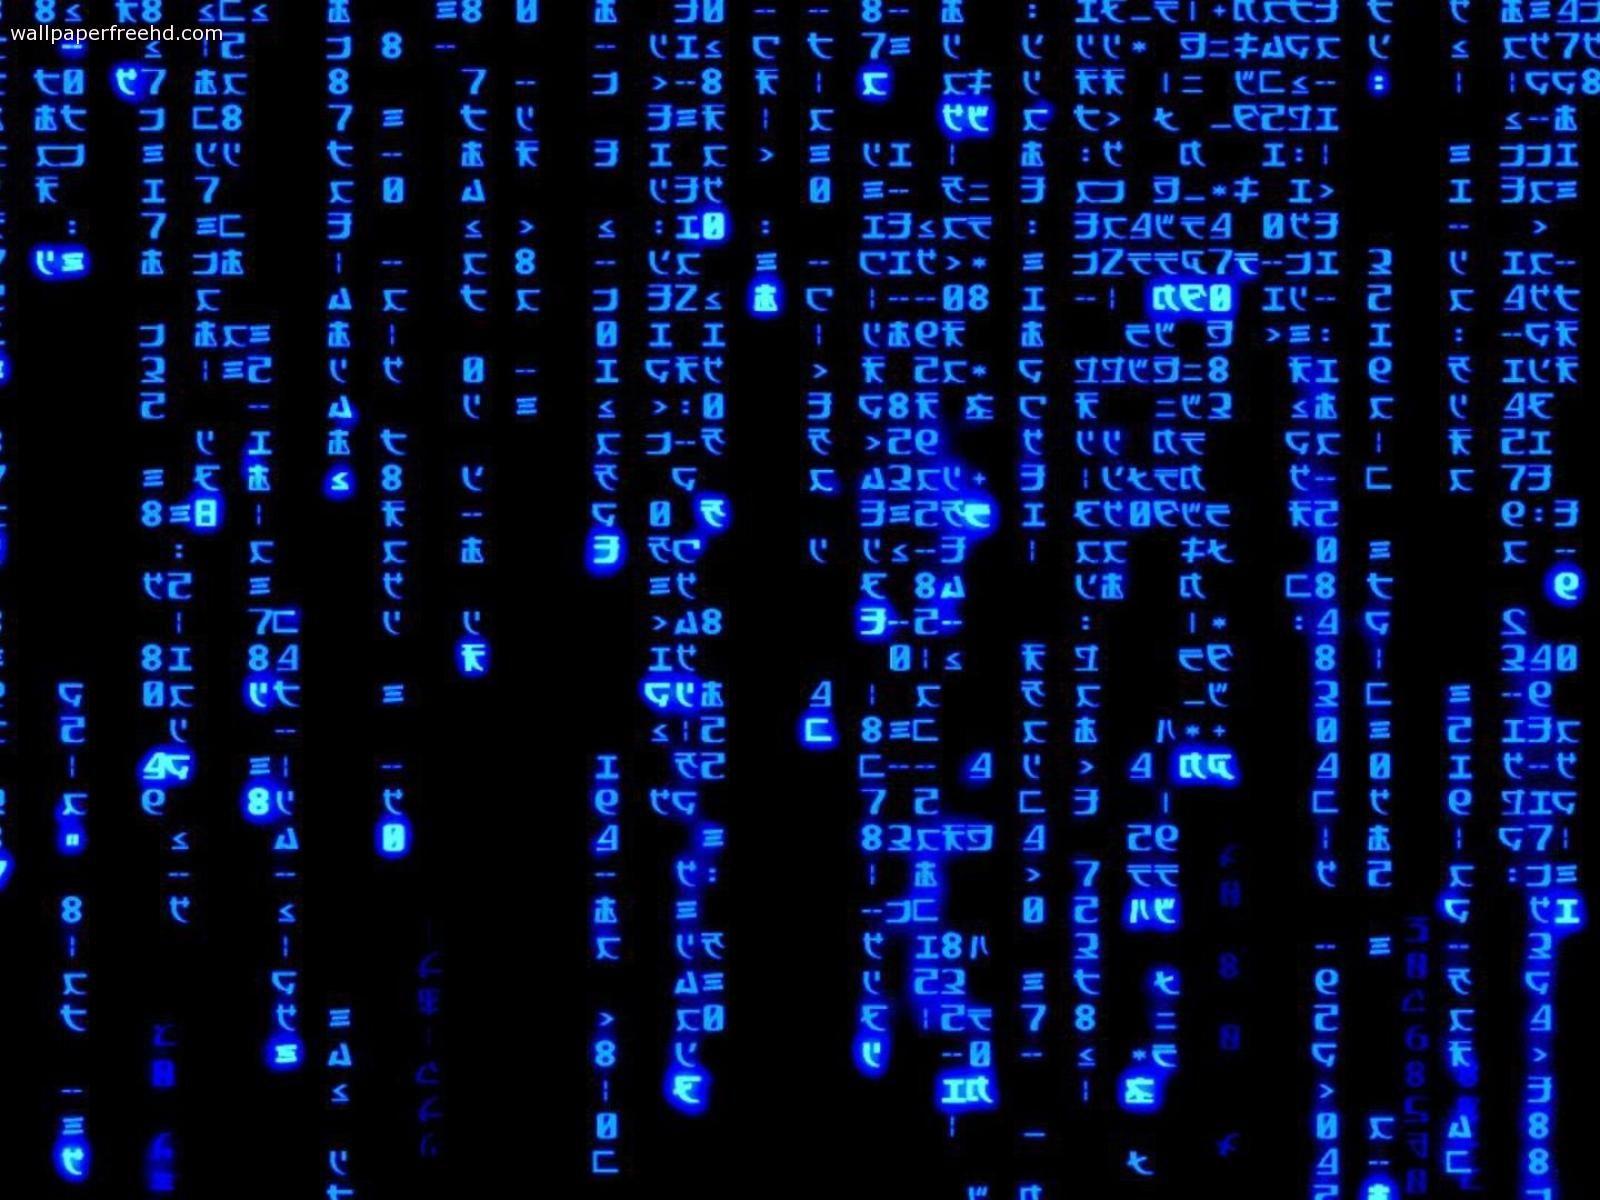 The Matrix Animated Graphics Animate It 1920 1080 Matrix Gif Wallpapers 20 Wallpapers Adorabl Digital Wallpaper Code Wallpaper Black Background Wallpaper